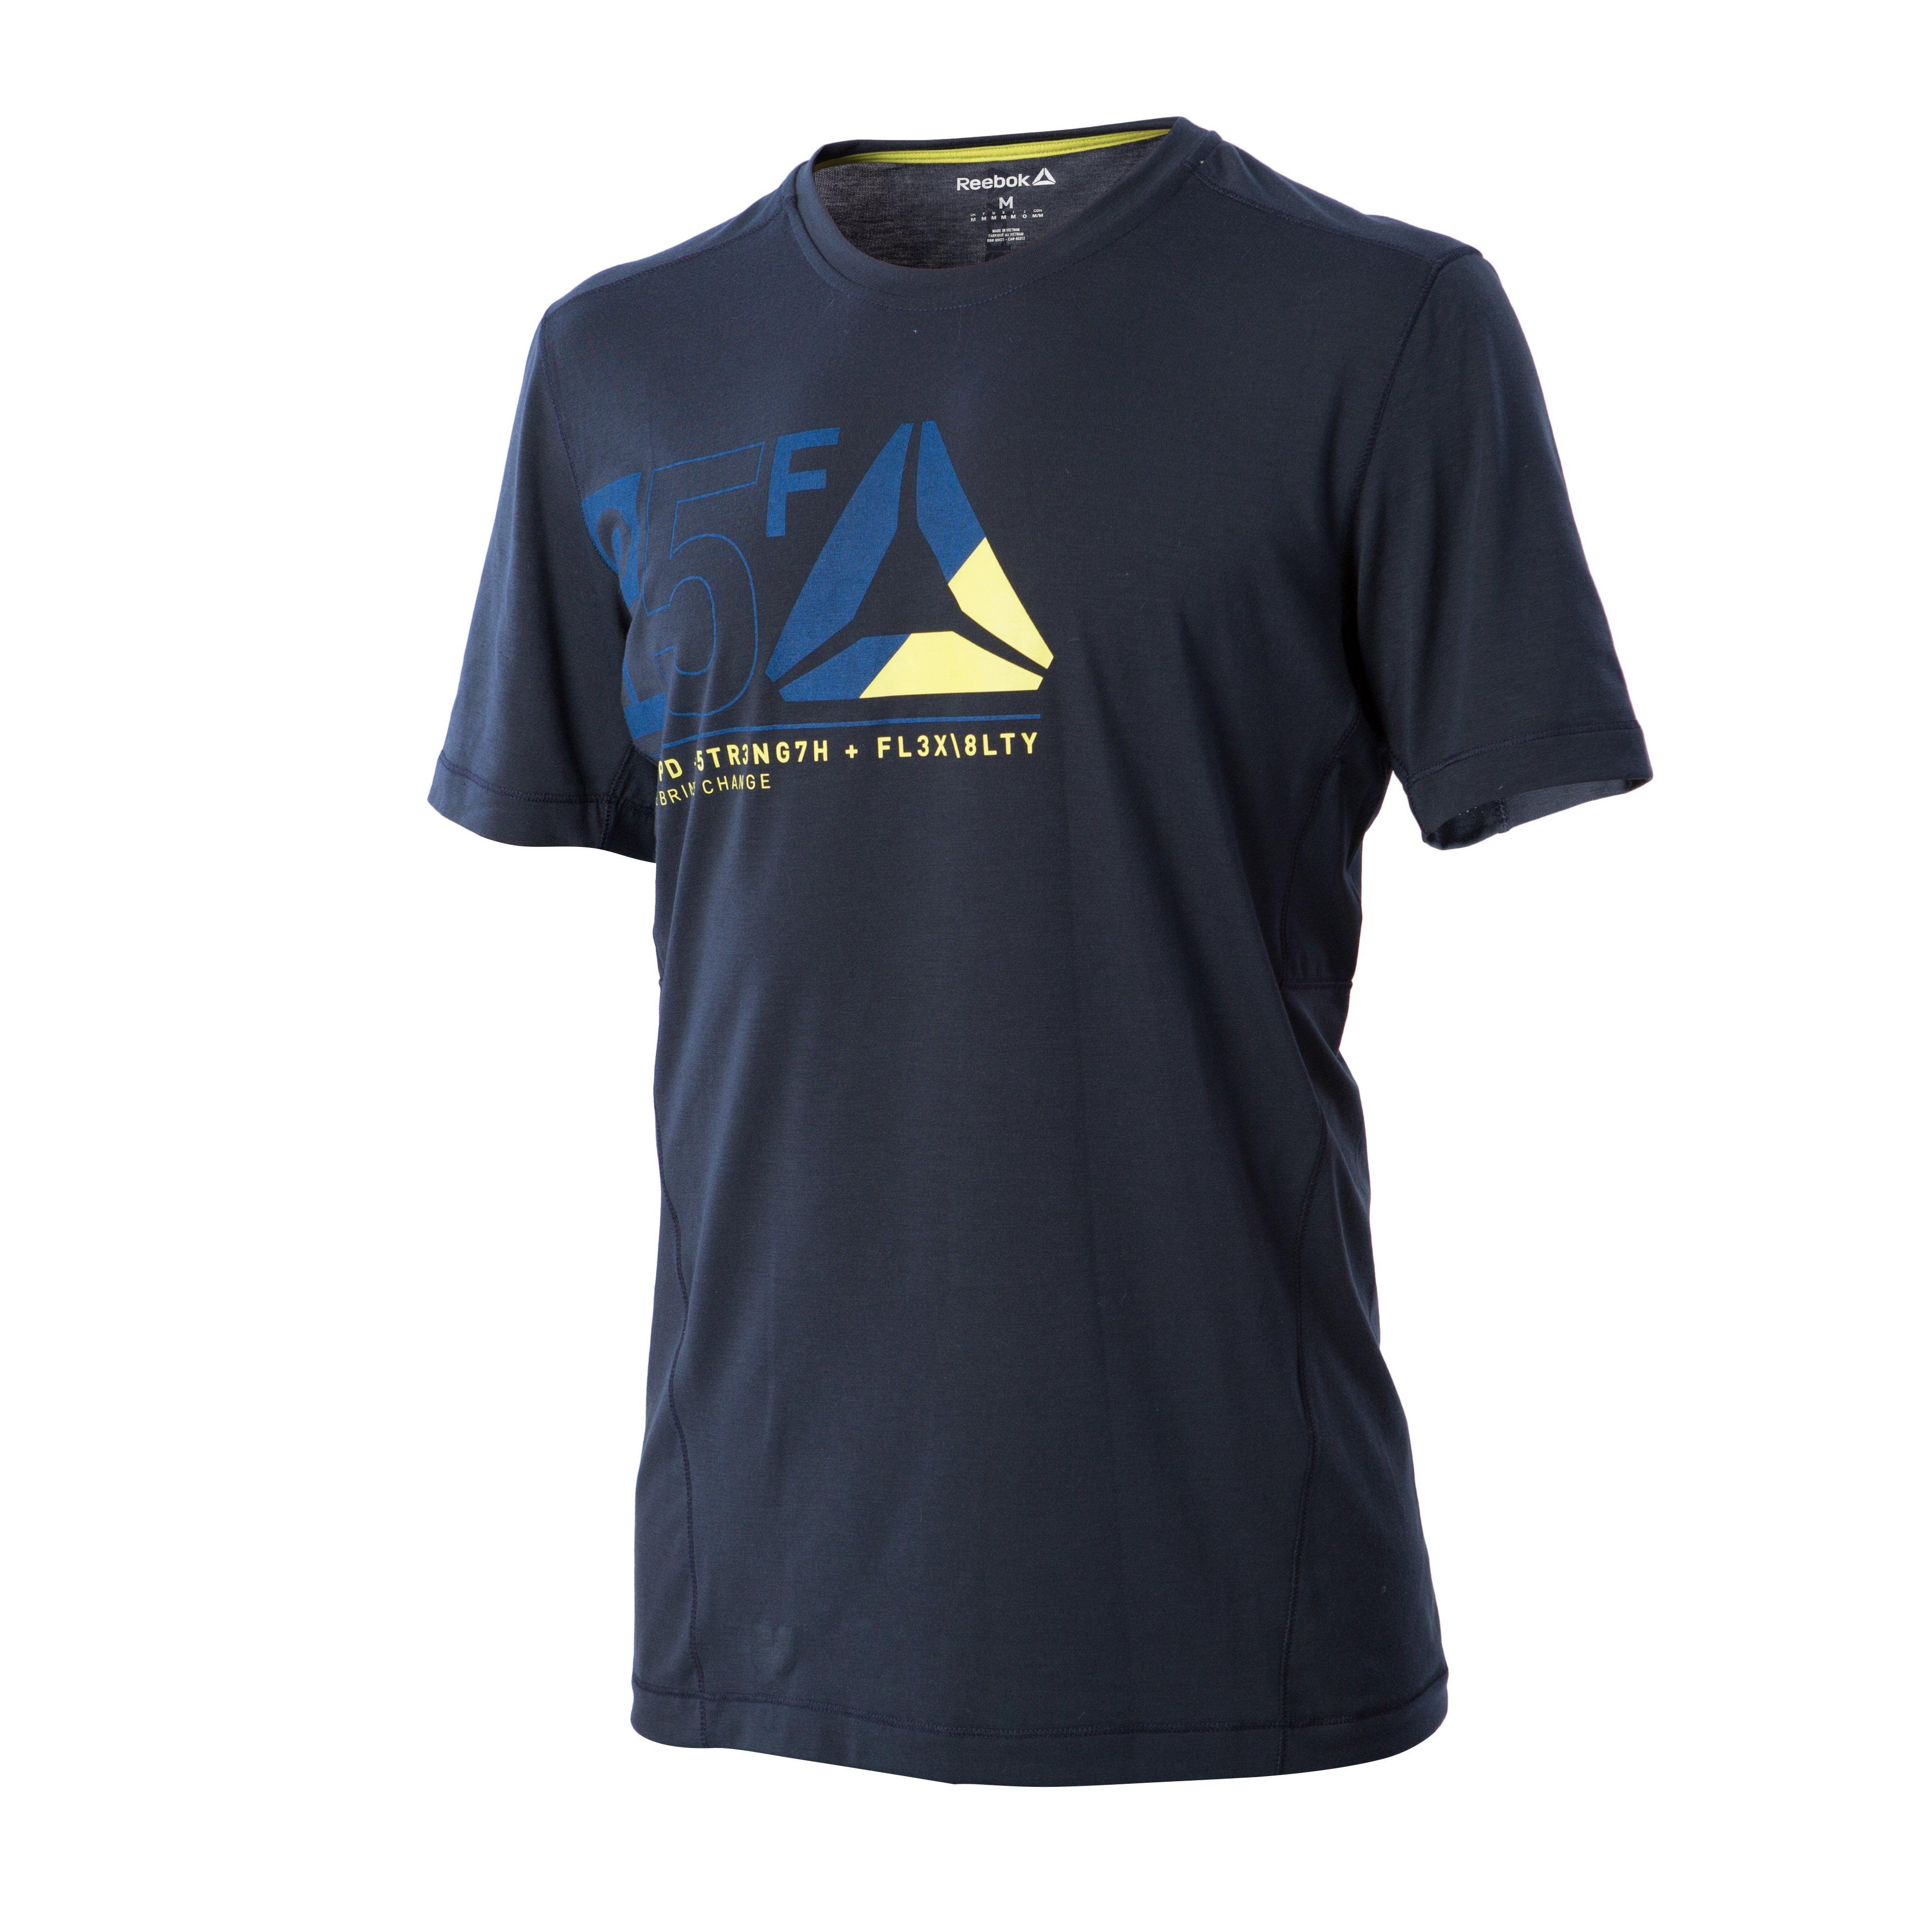 Reebok Tee-Shirt Graphic One Series M v�tement running homme